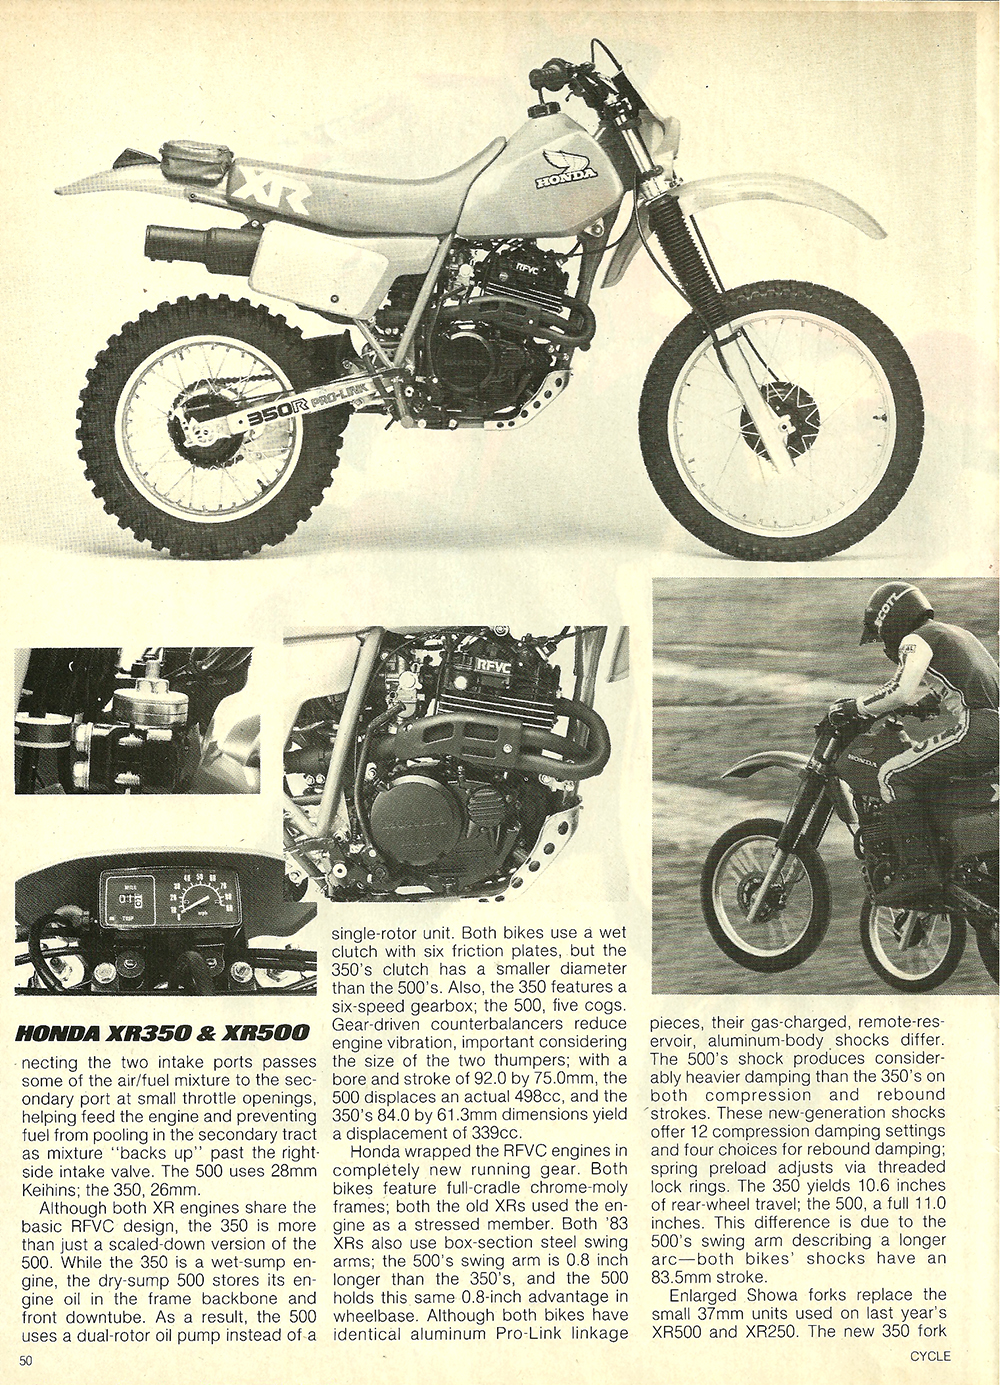 1983 Honda XR350R XR500R road test 3.jpg